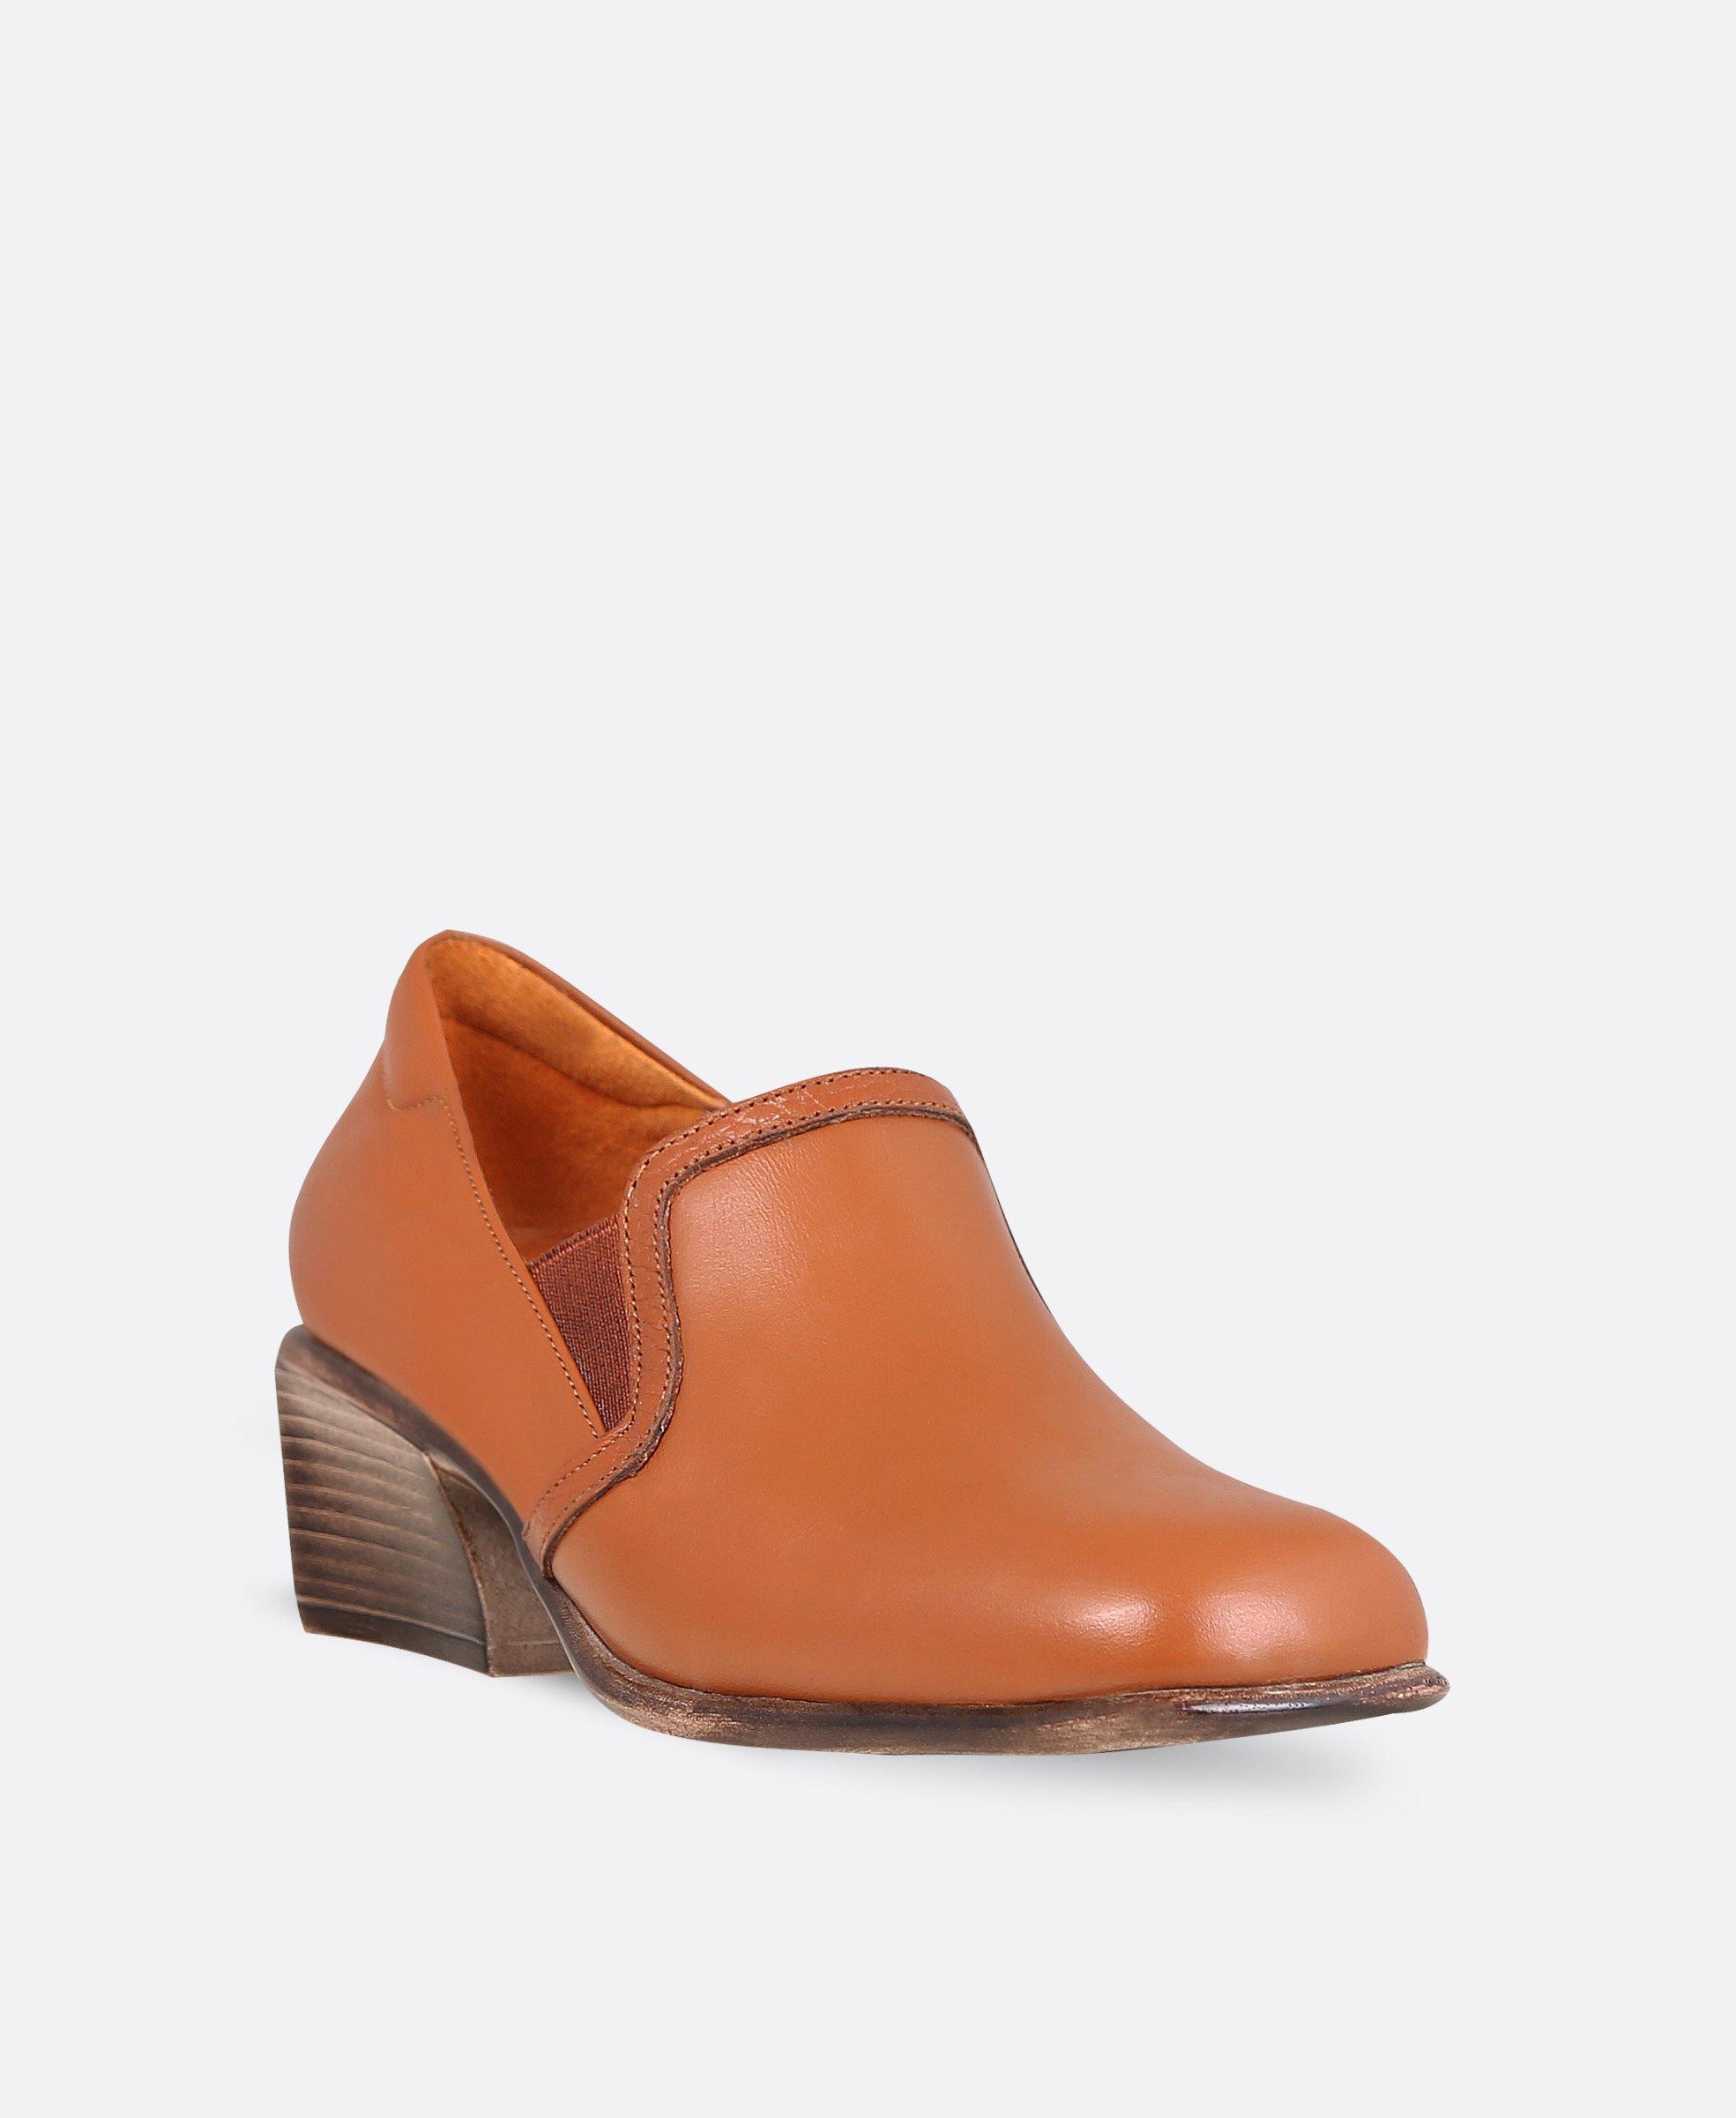 کفش زنانه چرم 0102